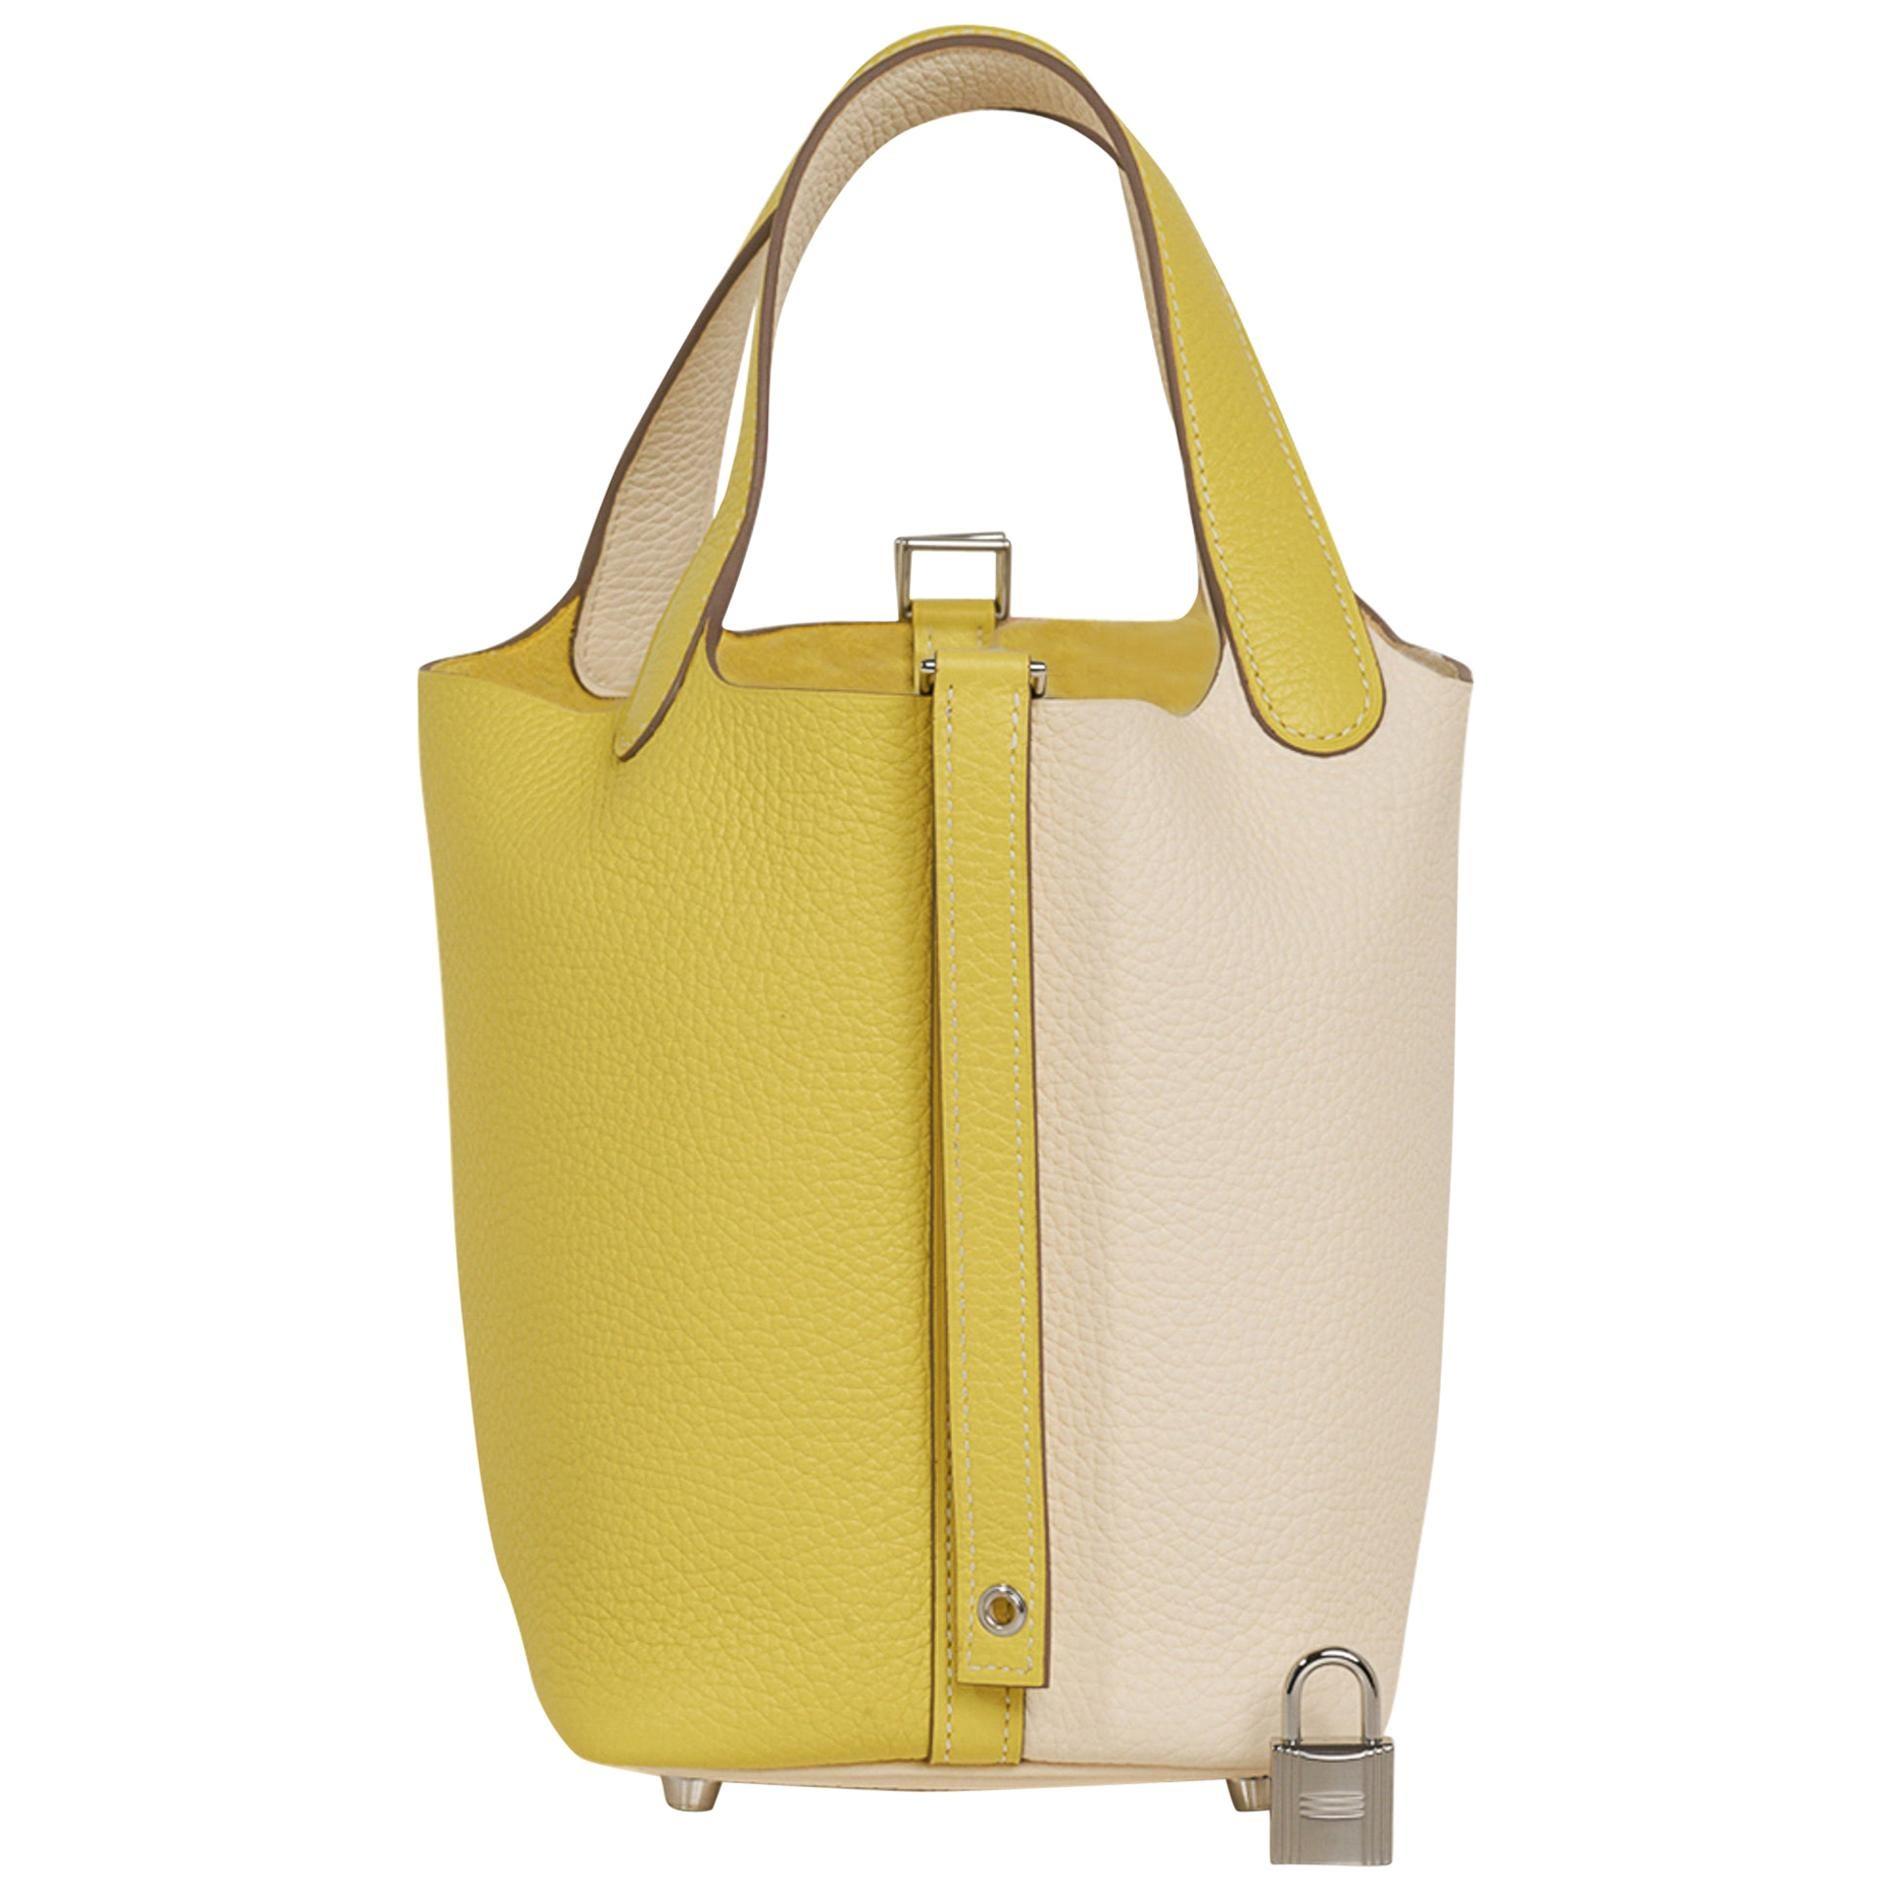 Hermes Picotin Lock 18 Casaque Bag Lime / Nata Bi-Color Tote Clemence Palladium